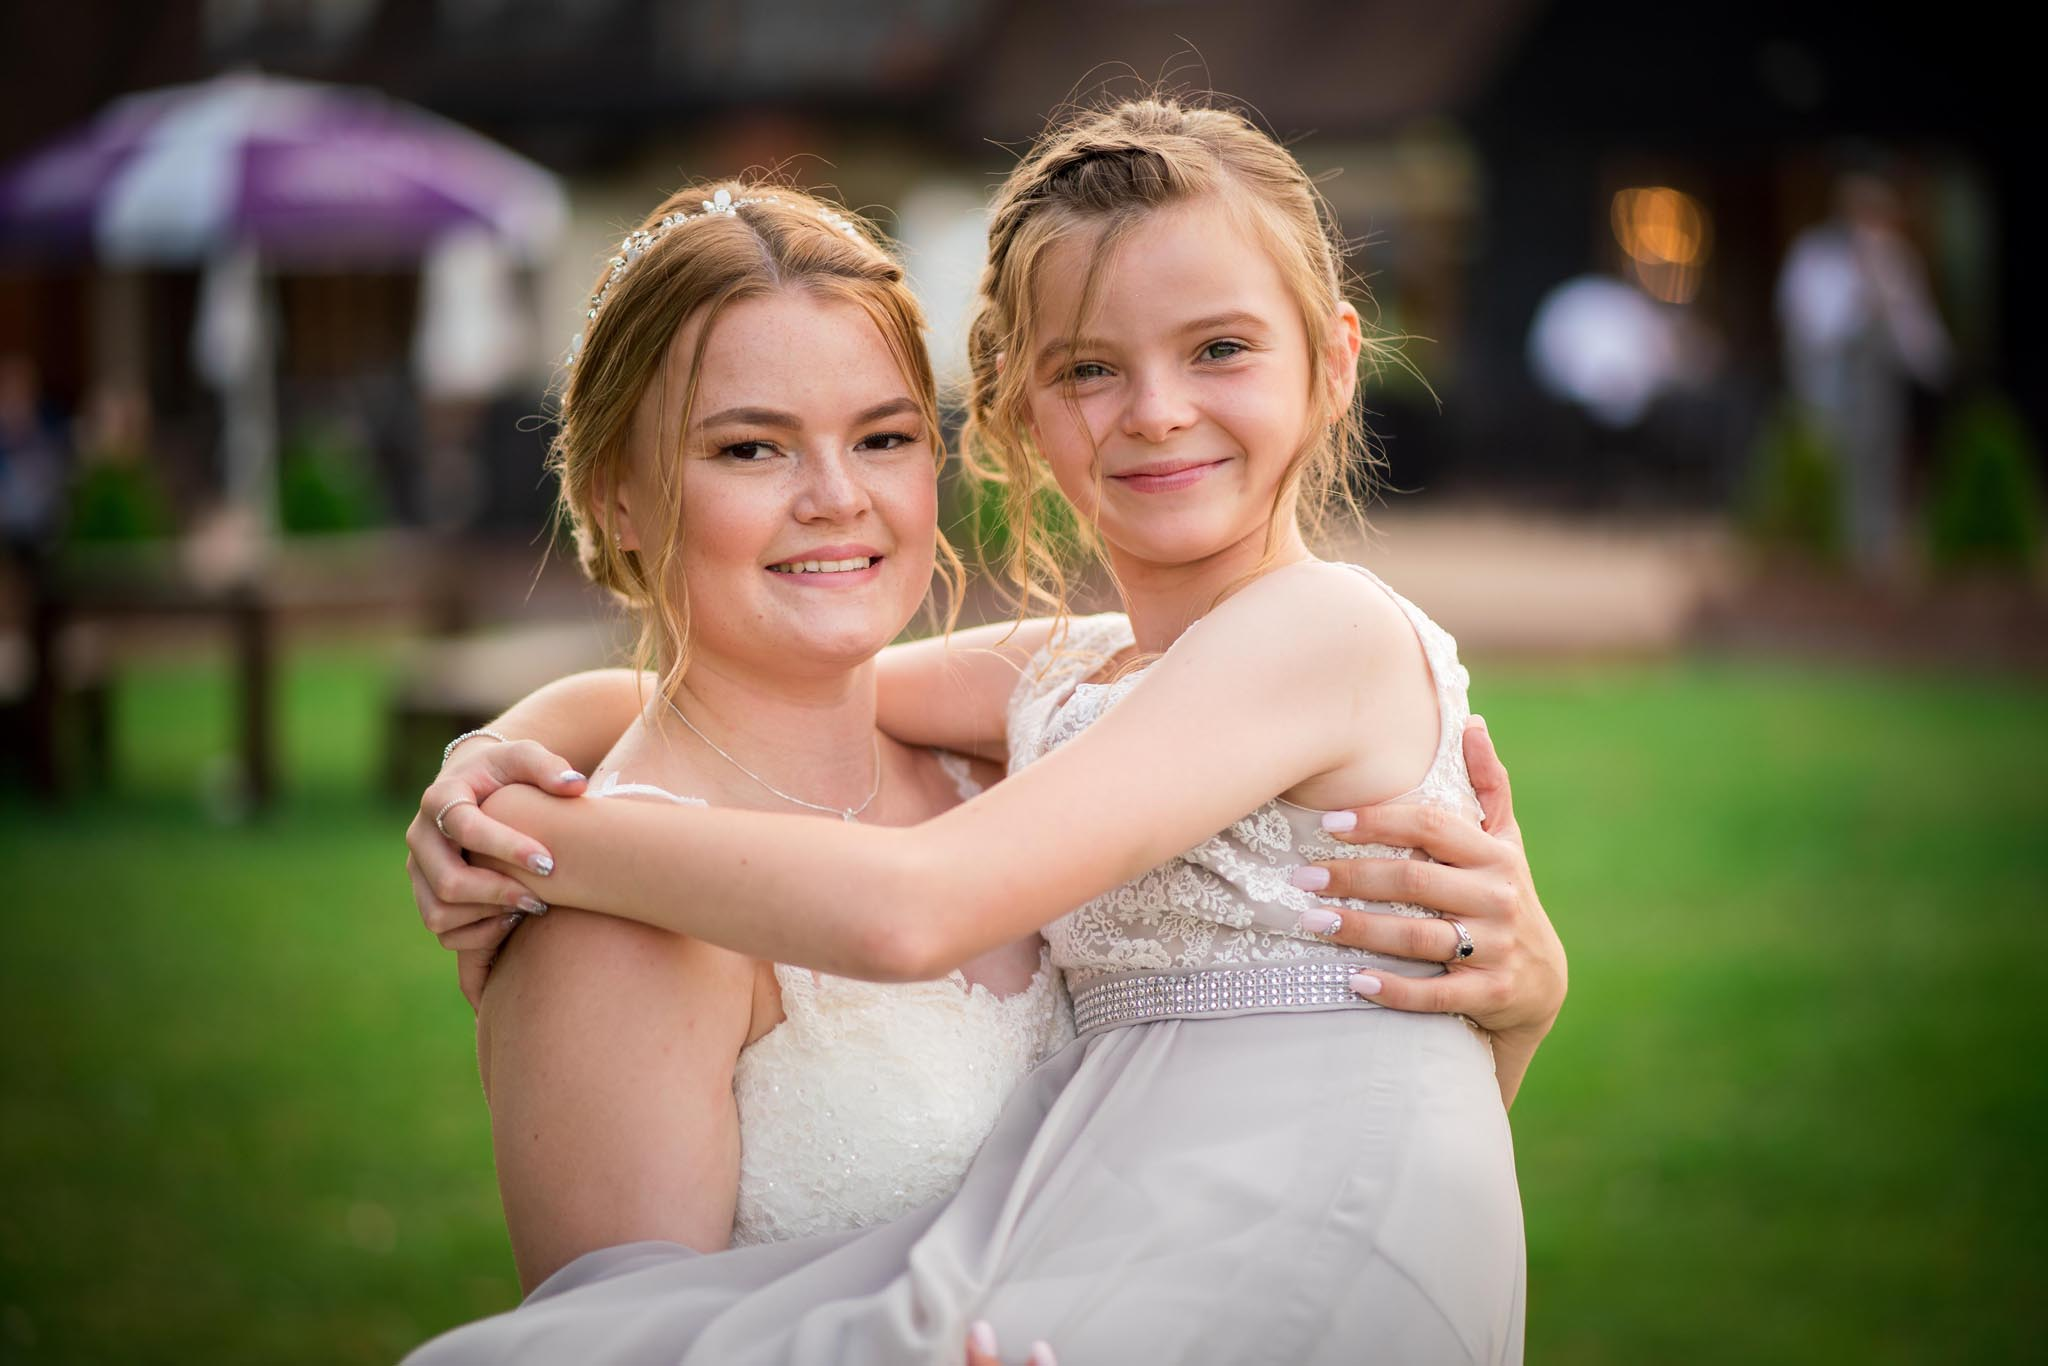 656-family-friends-Luke-Yasmin-The-Rayleigh-Club-Wedding-Photography.jpg